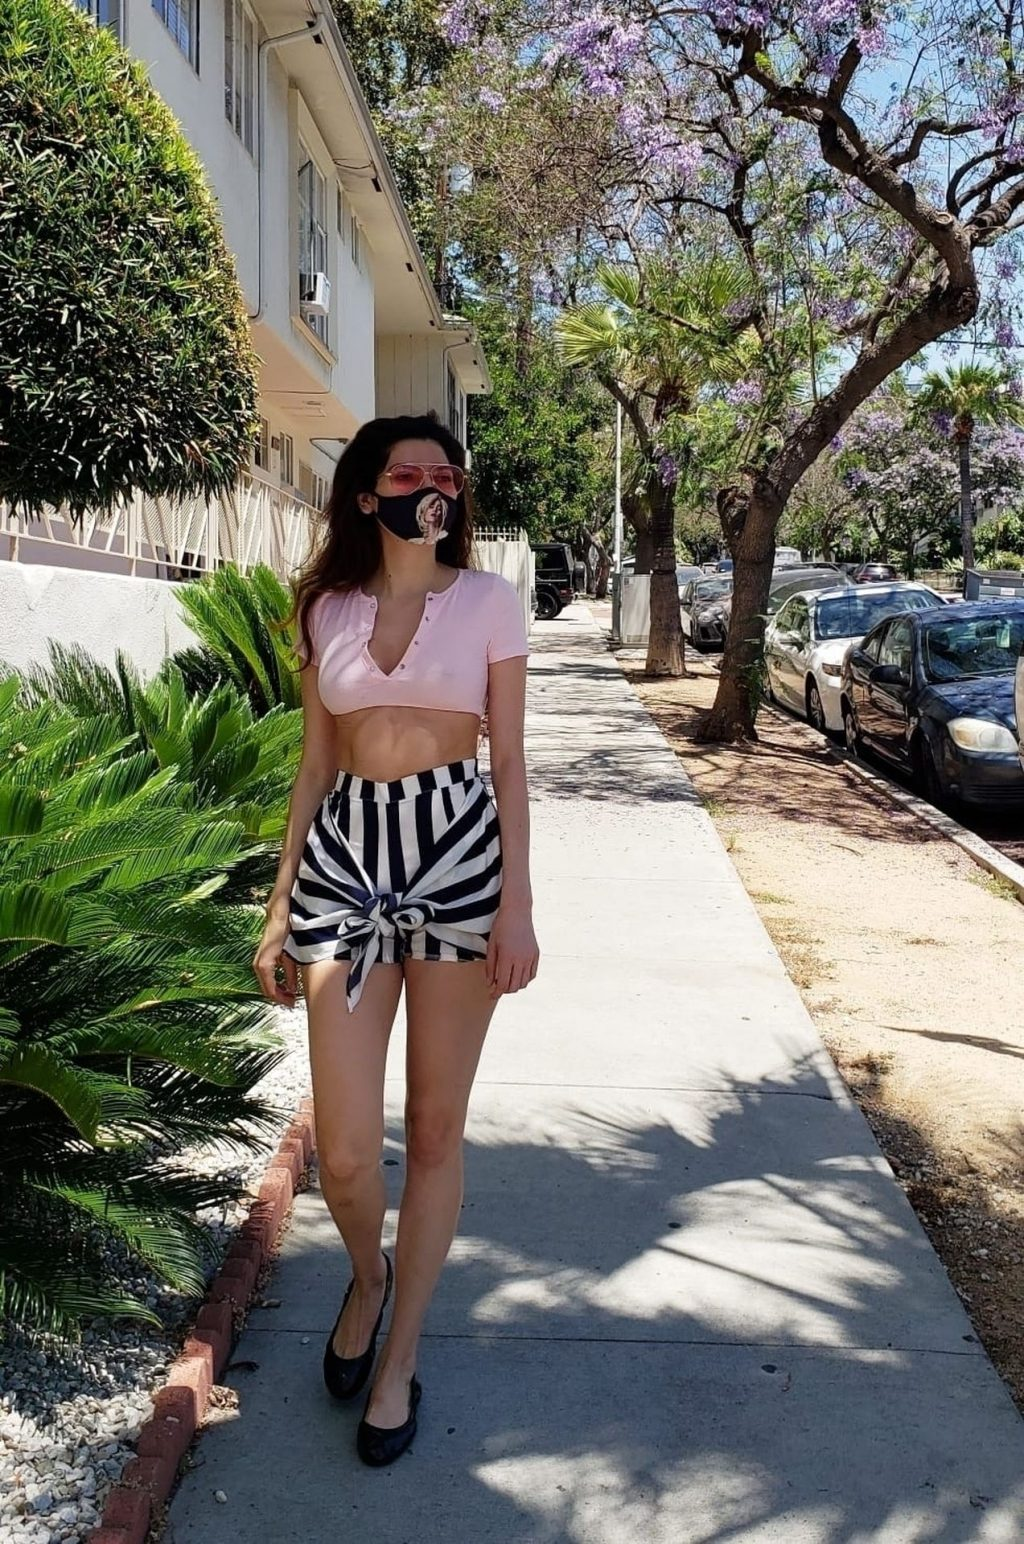 Leggy Blanca Blanco Grabs Lunch to-go in WeHo (14 Photos)